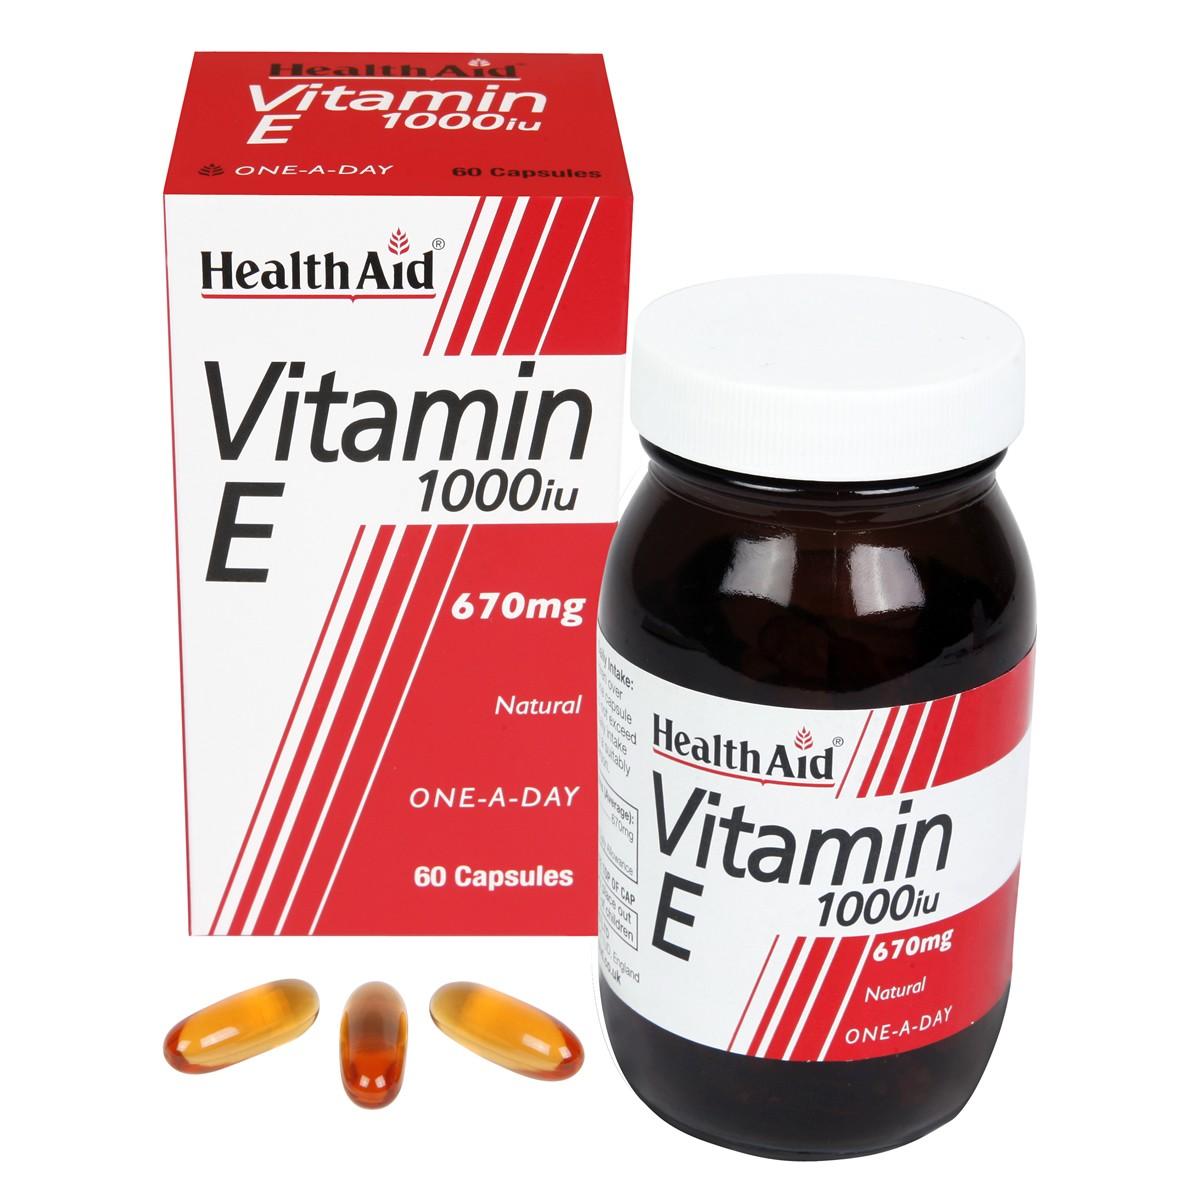 HealthAid Vitamin E 1000iu Natural Capsules